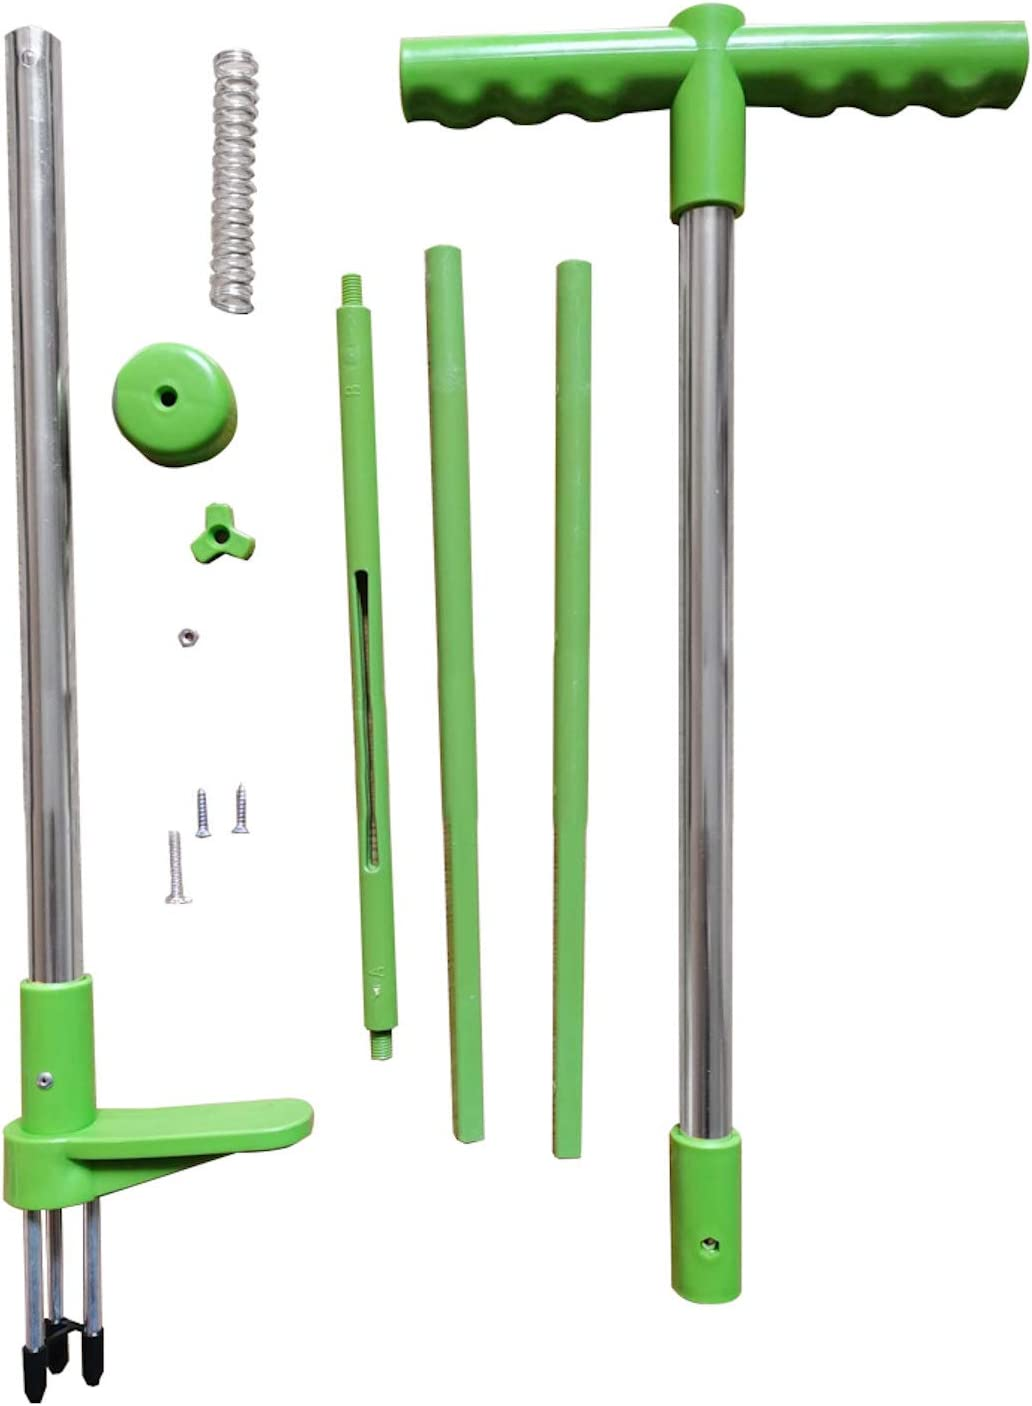 zanasta 2x Weed Remover Picker 100 cm Tool for garden lawn